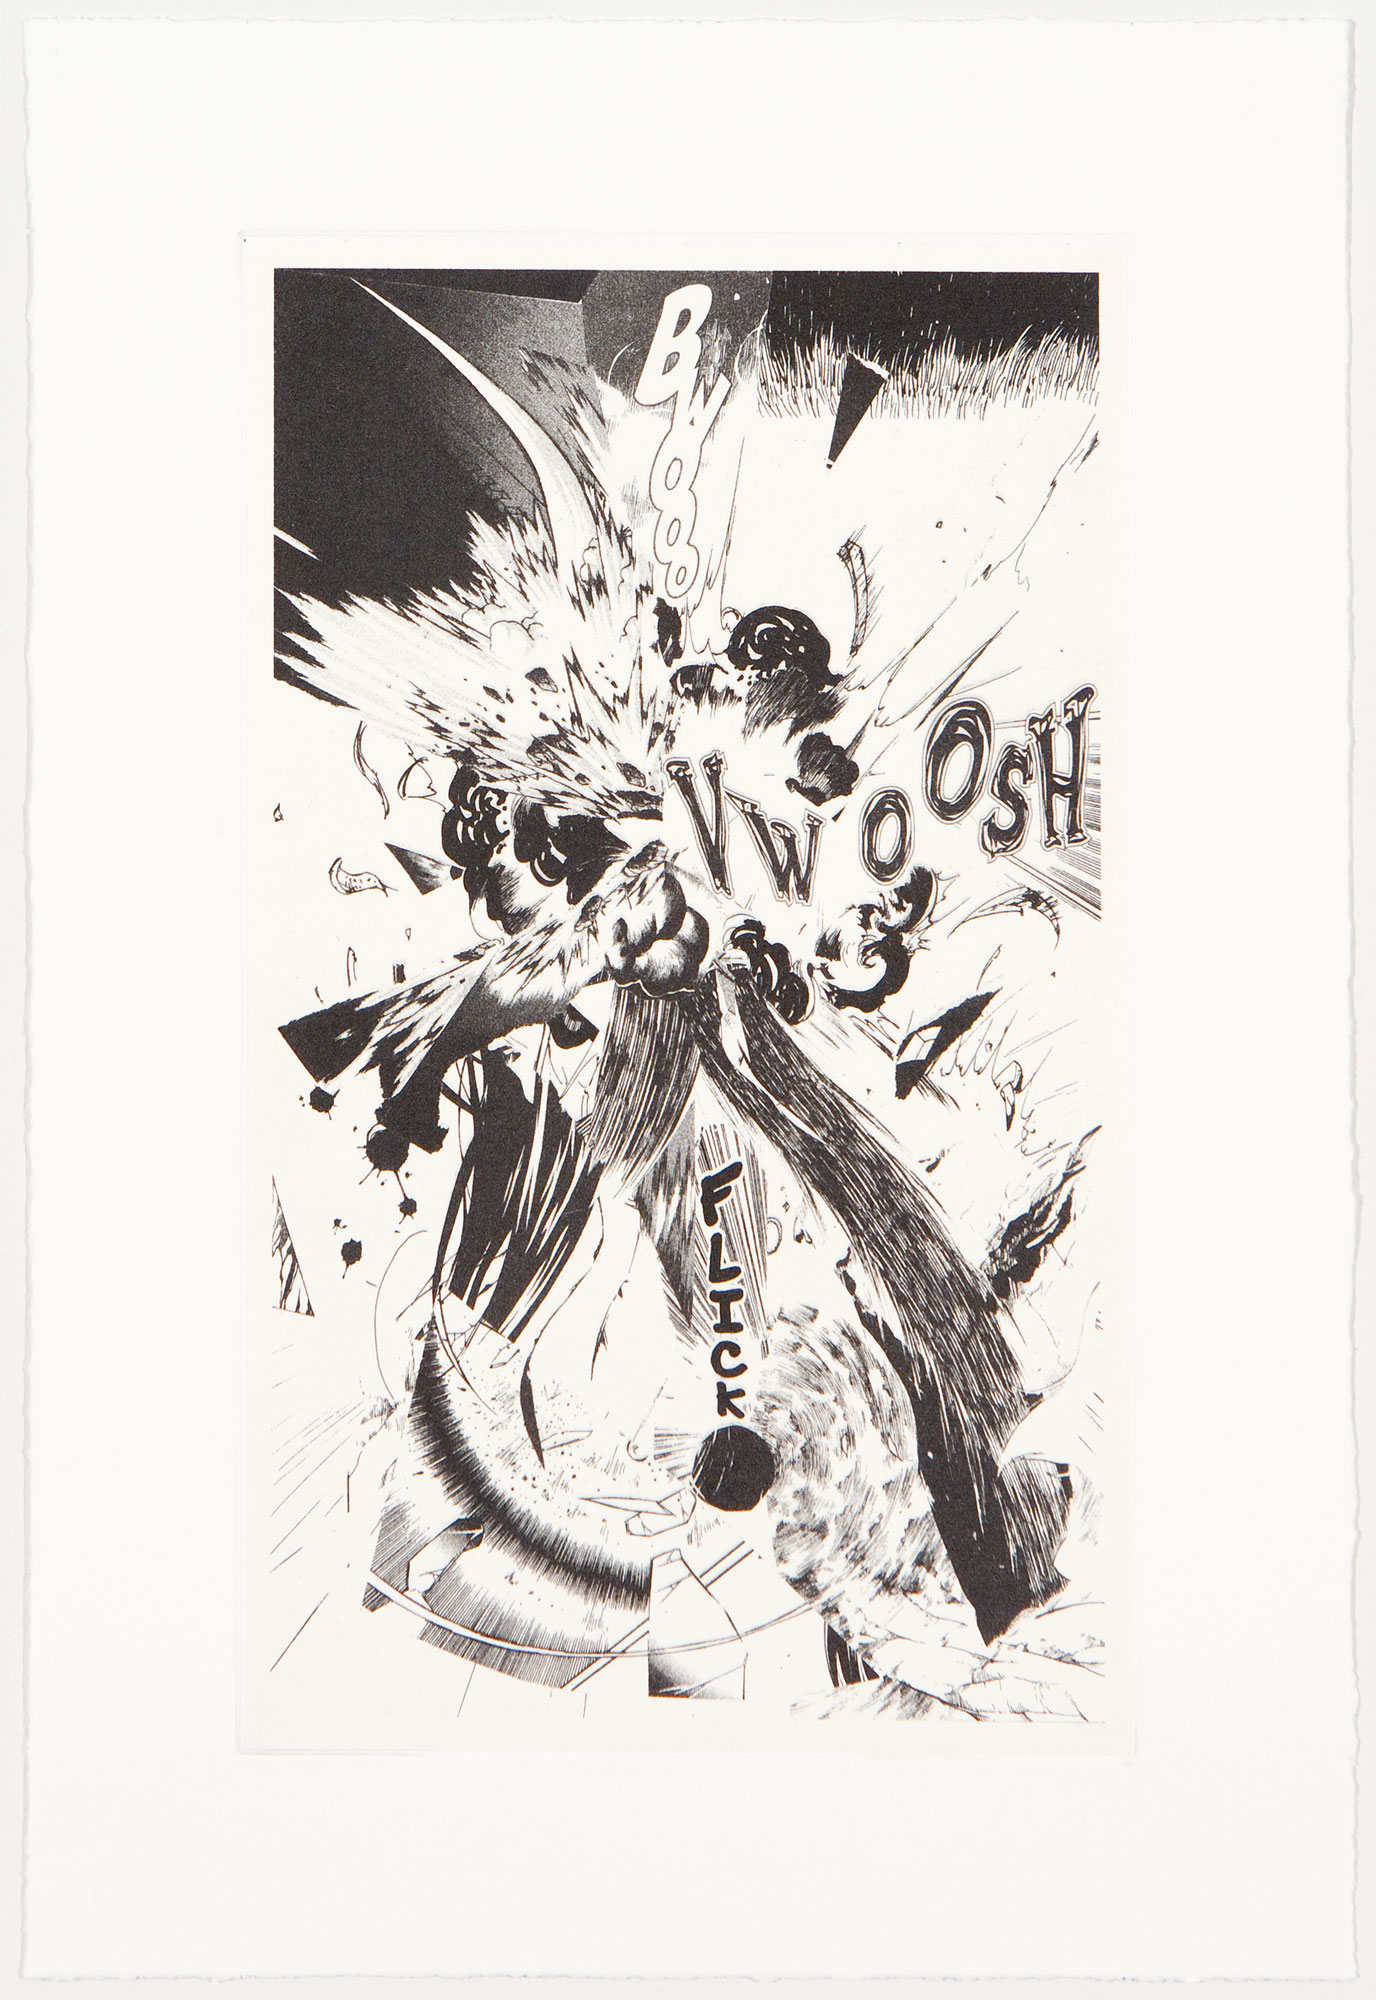 Vwoosh by Christian Marclay